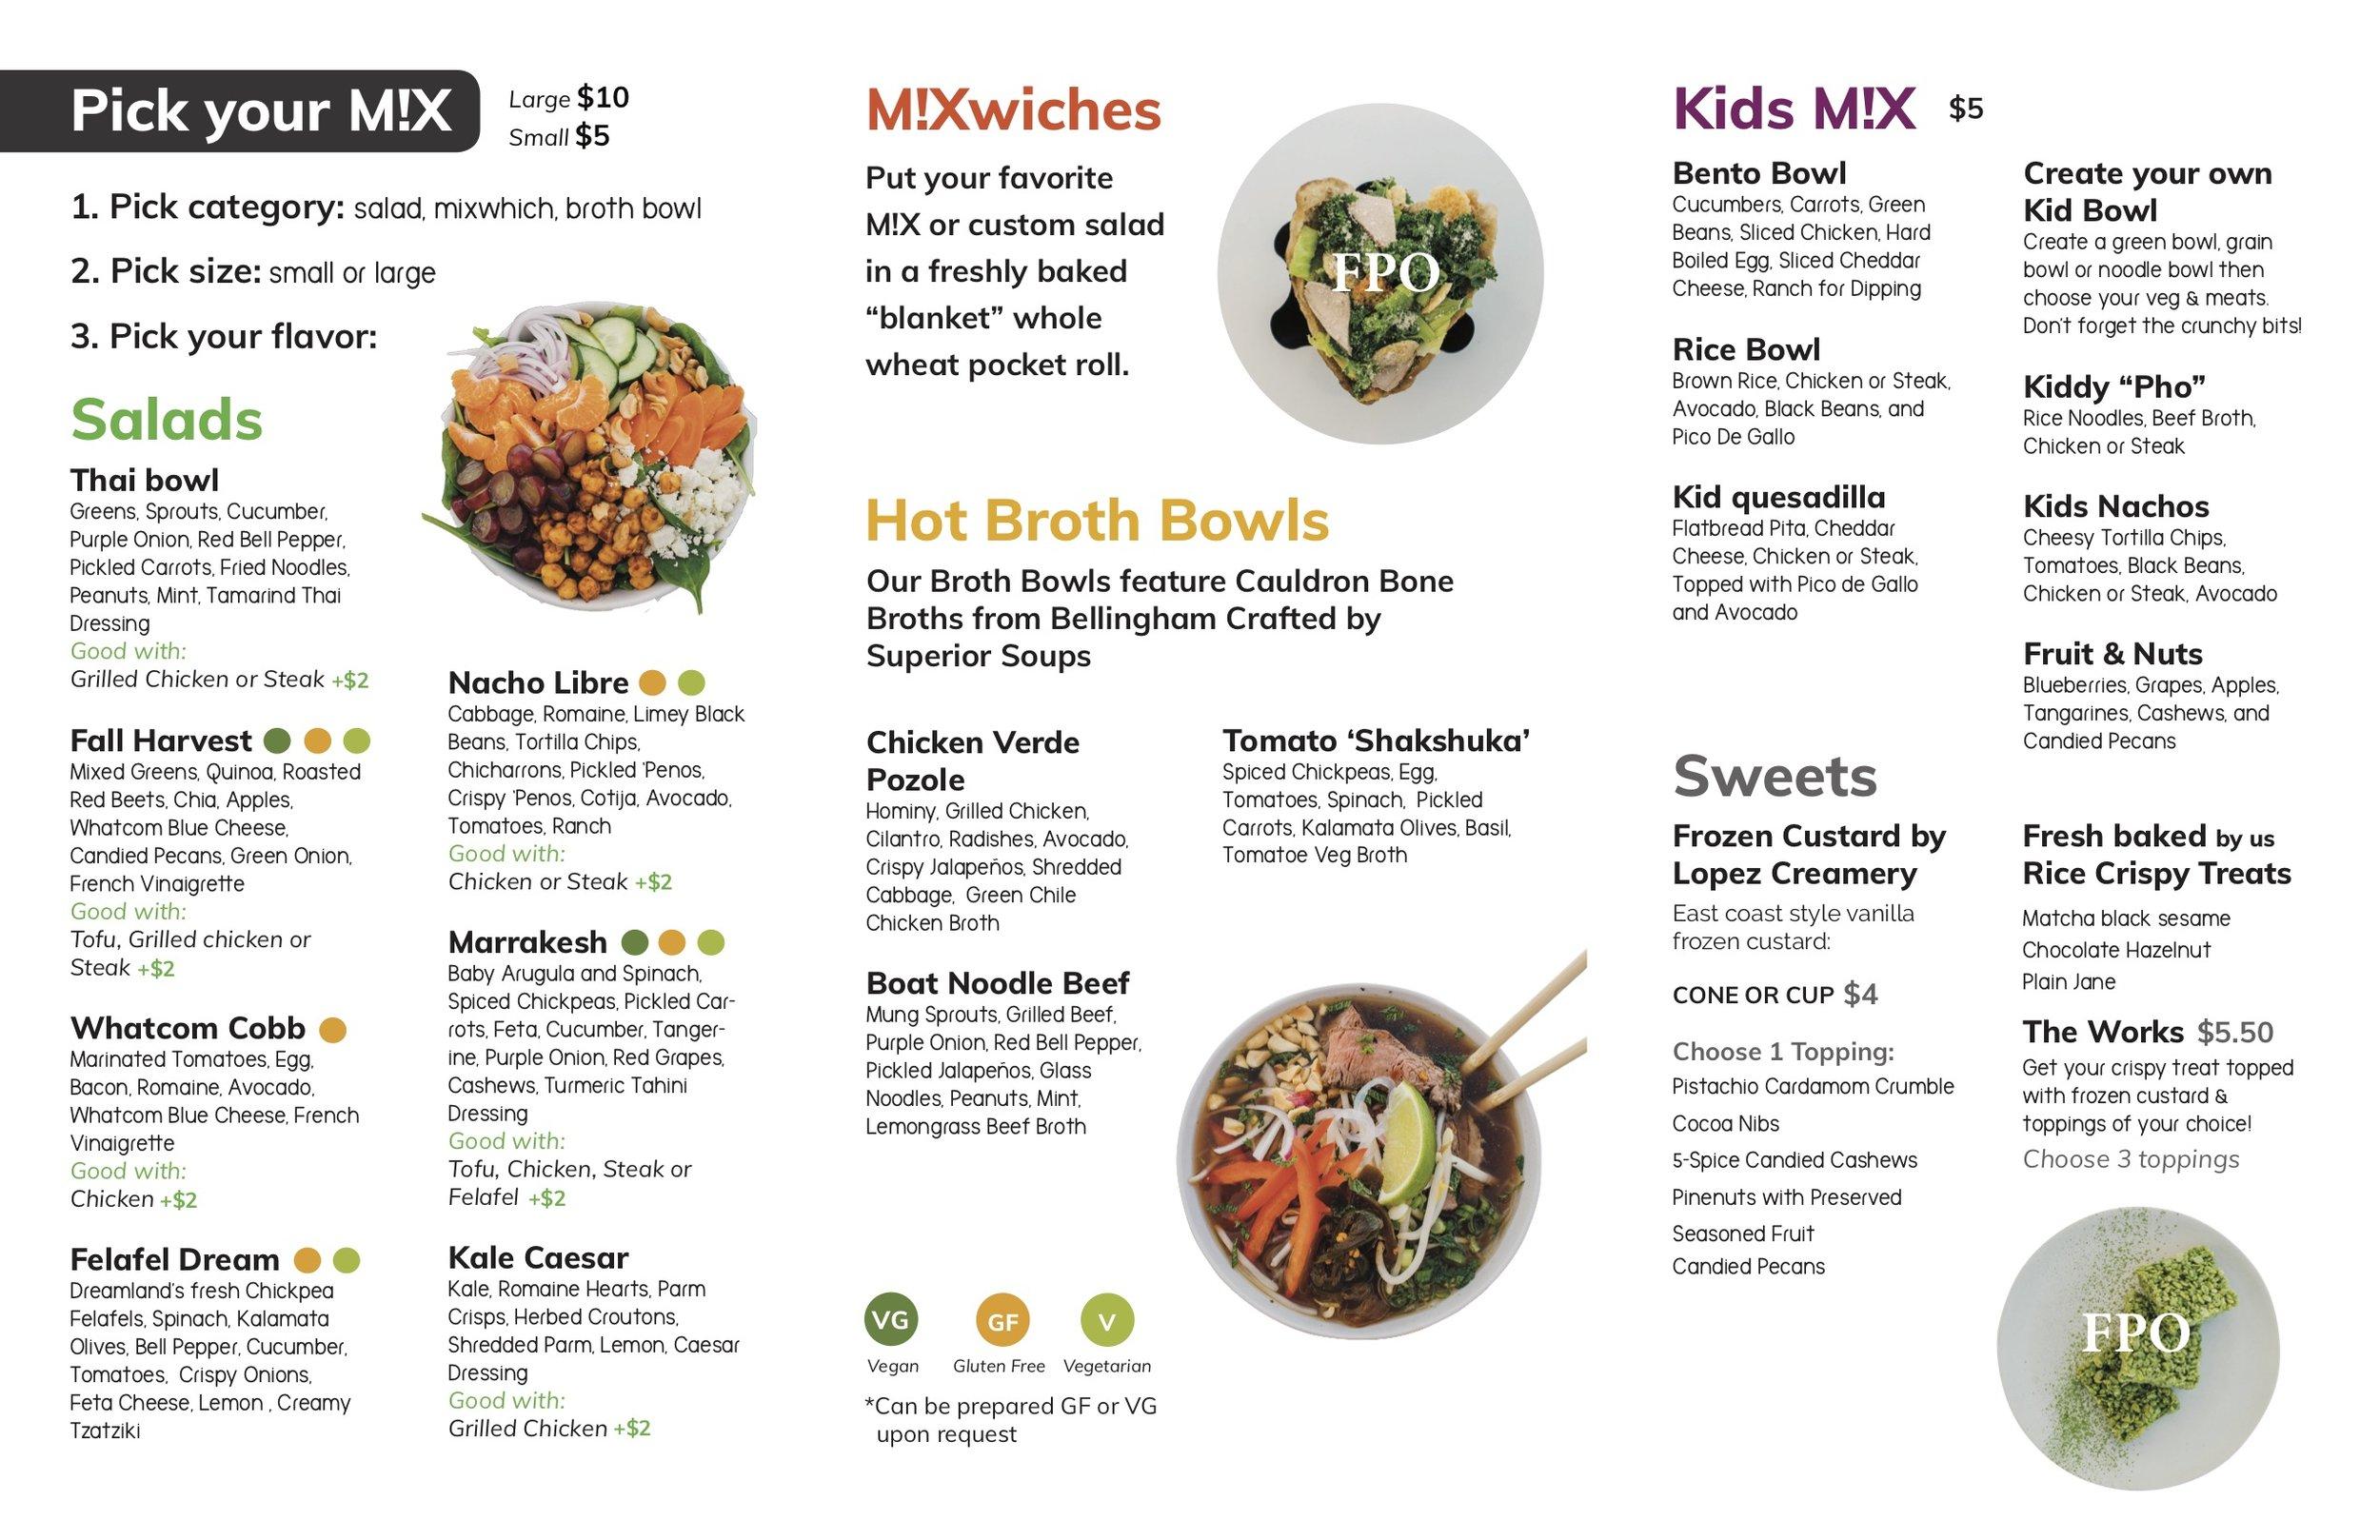 *Inside of the M!X menu